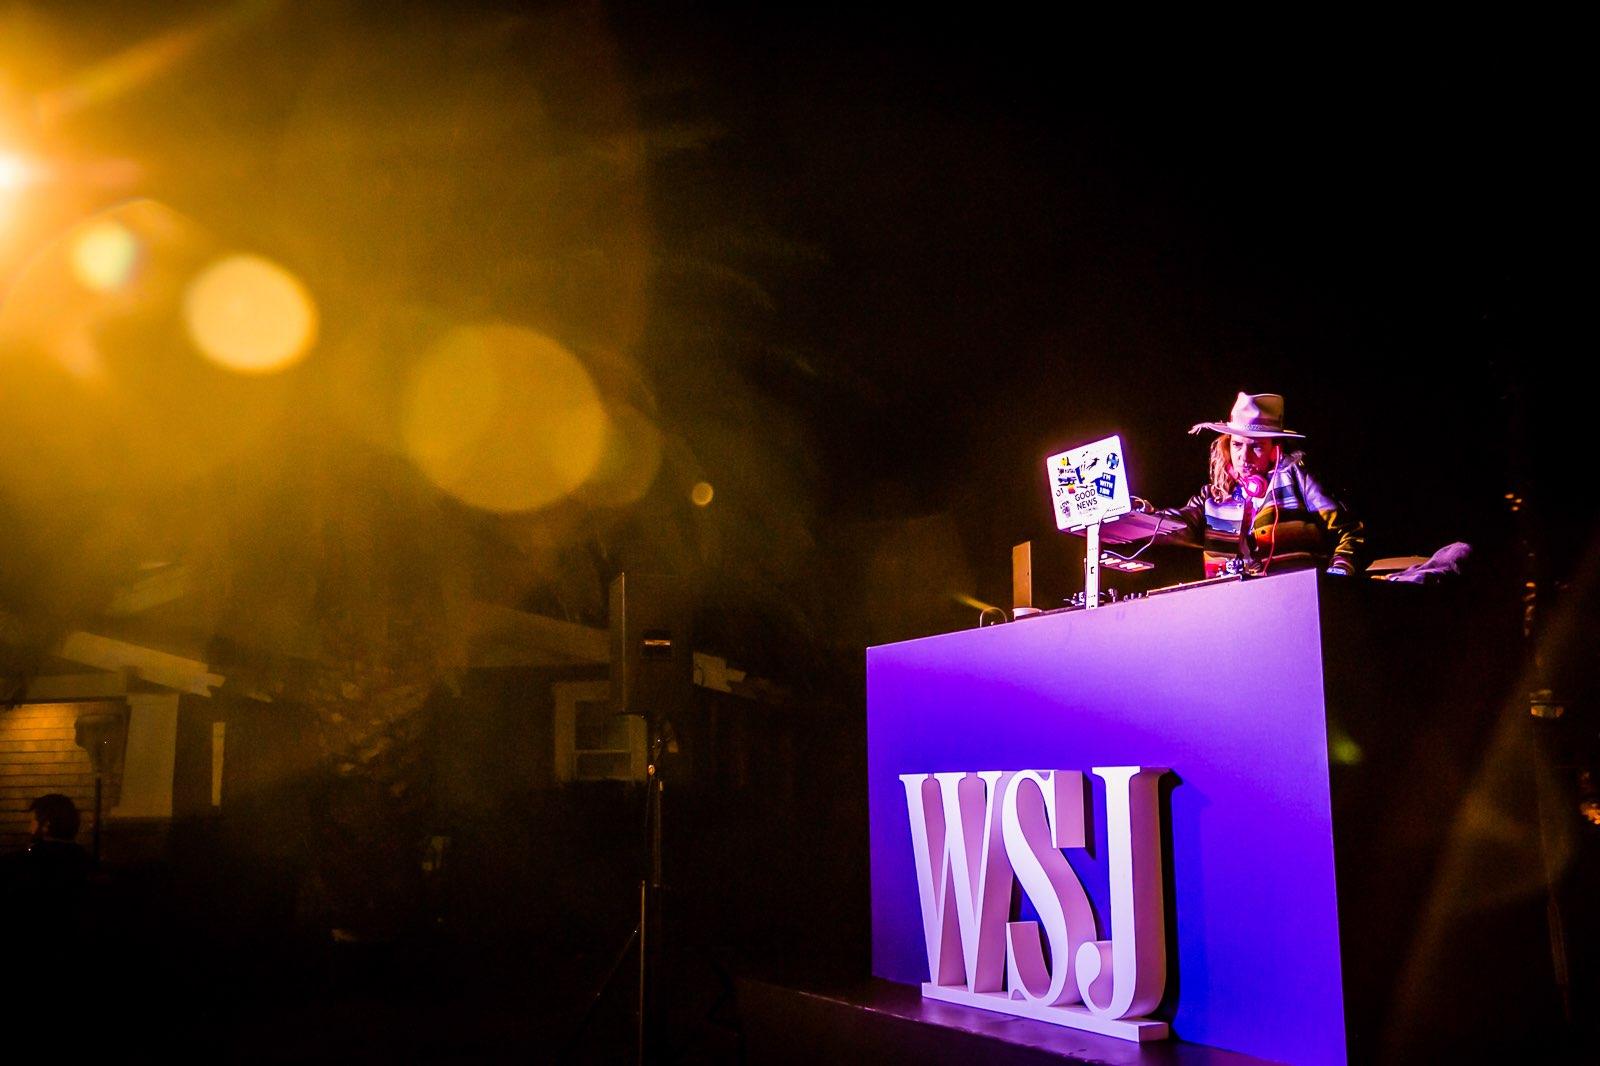 montage-laguna-beach-wsj-tech-live-event-DJ